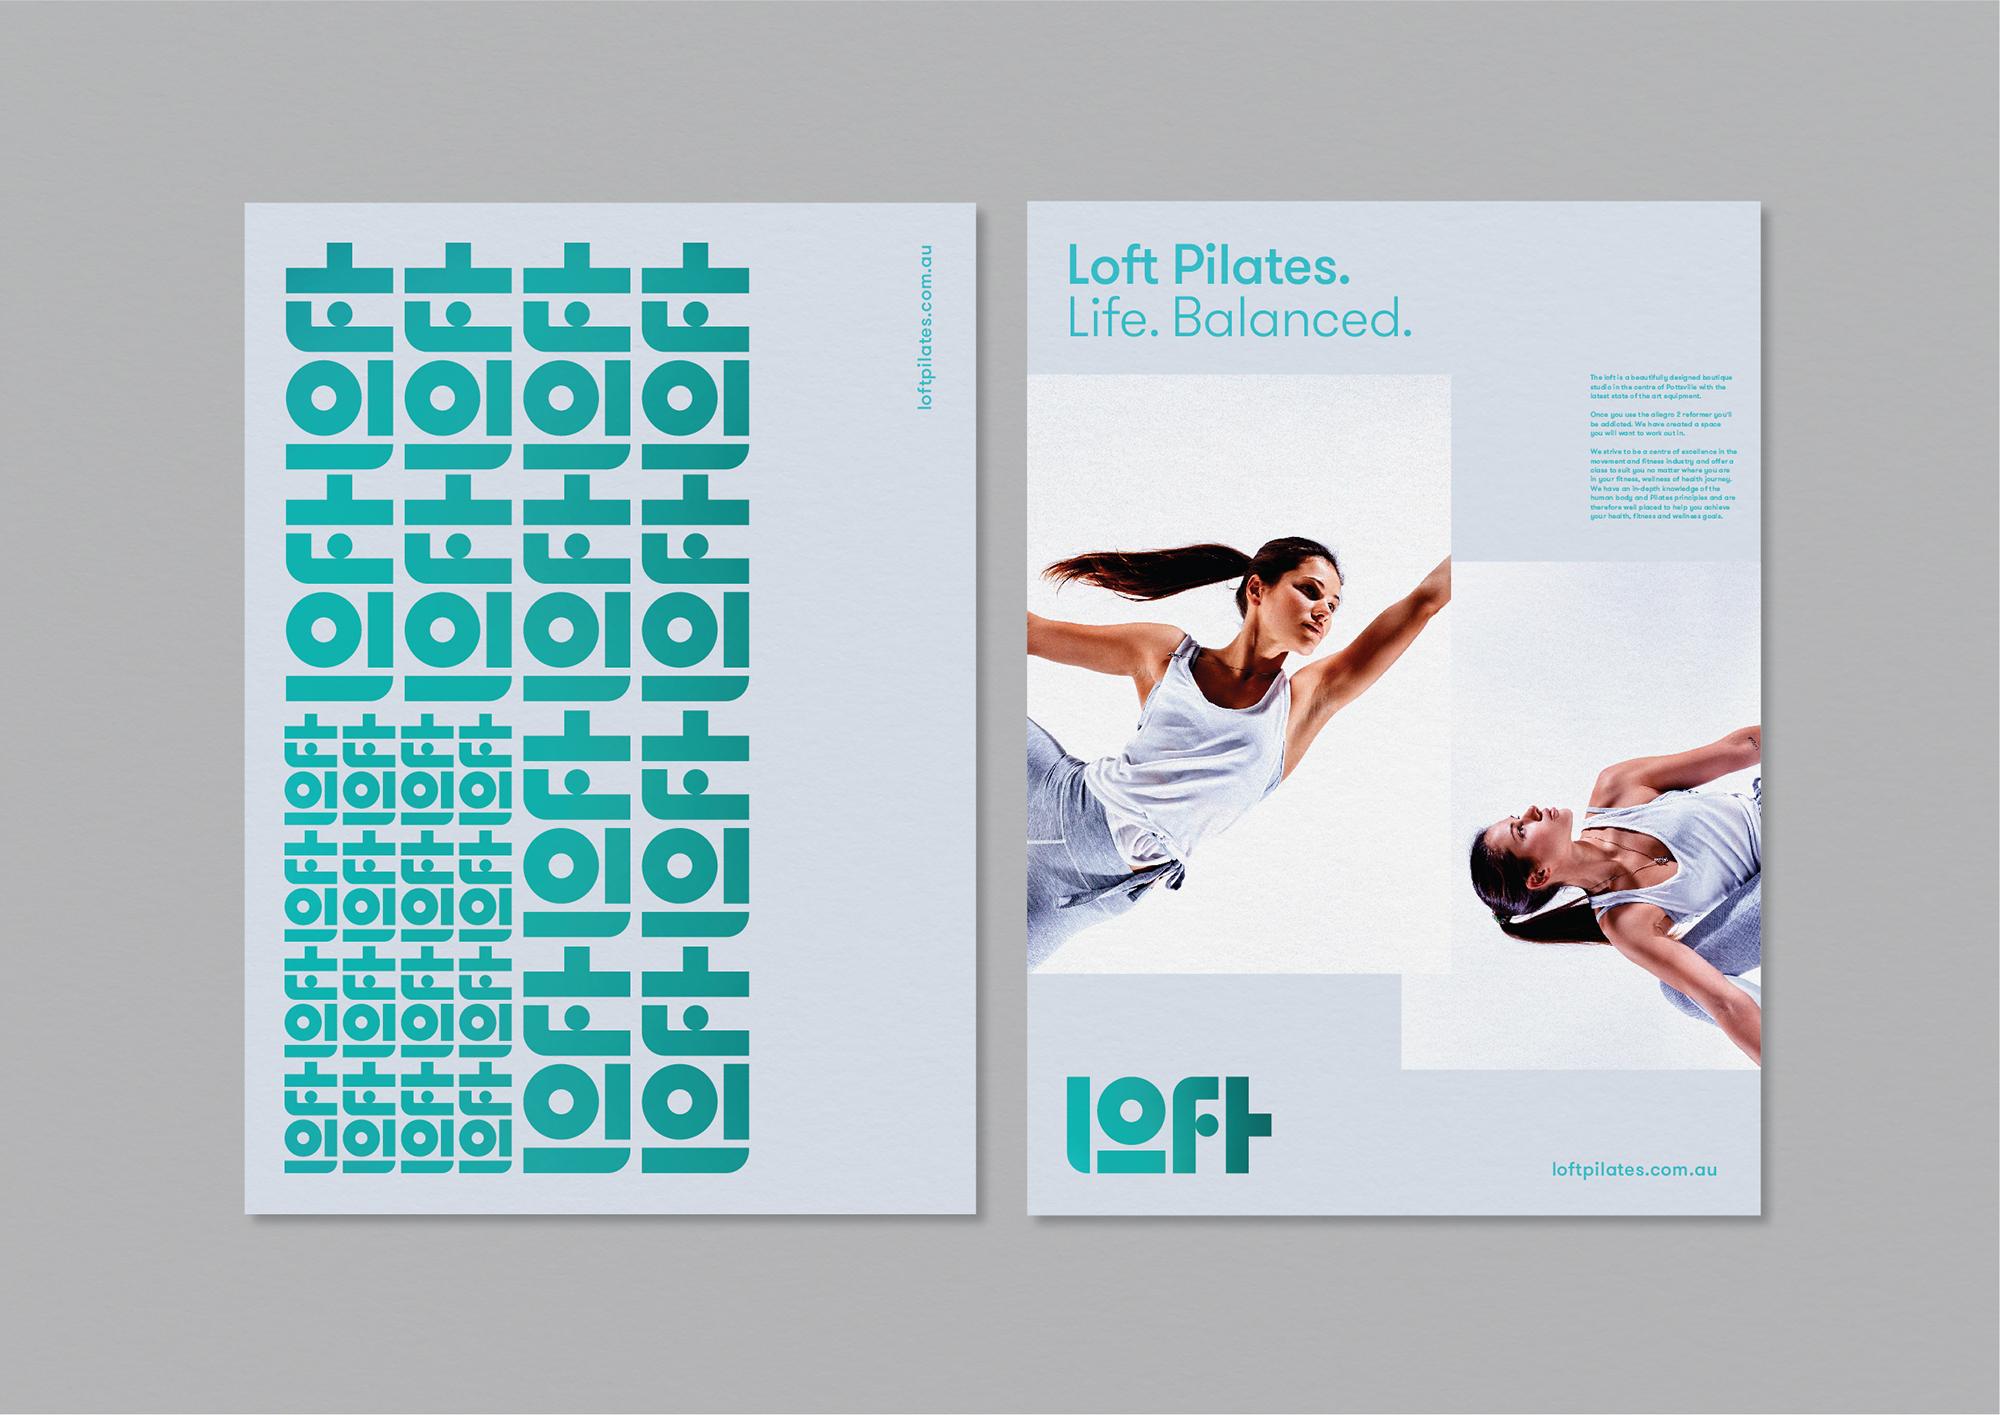 Loft Pilates CS 19-08.jpg